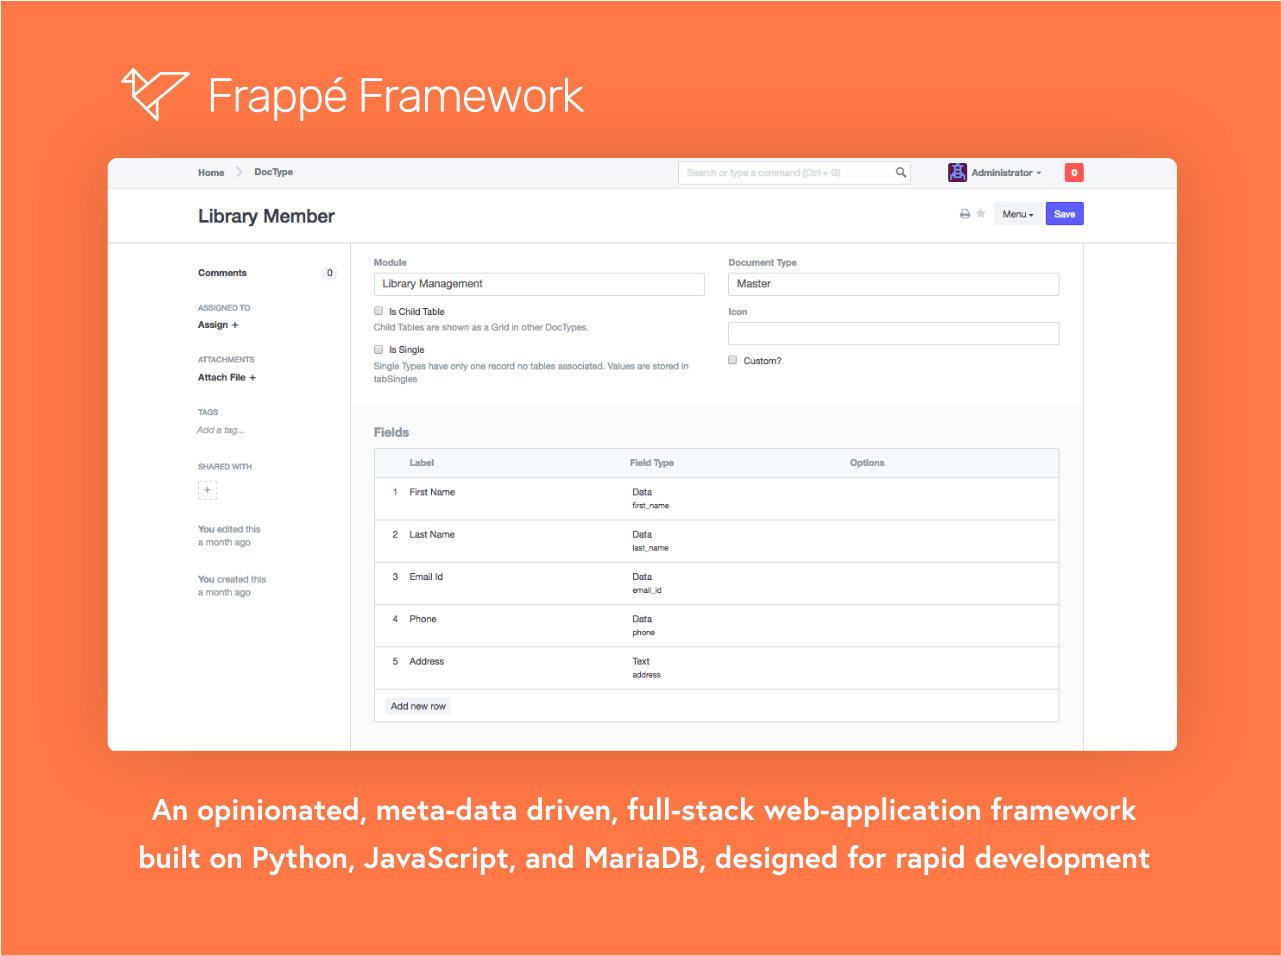 Code: Python, JavaScript, Processing